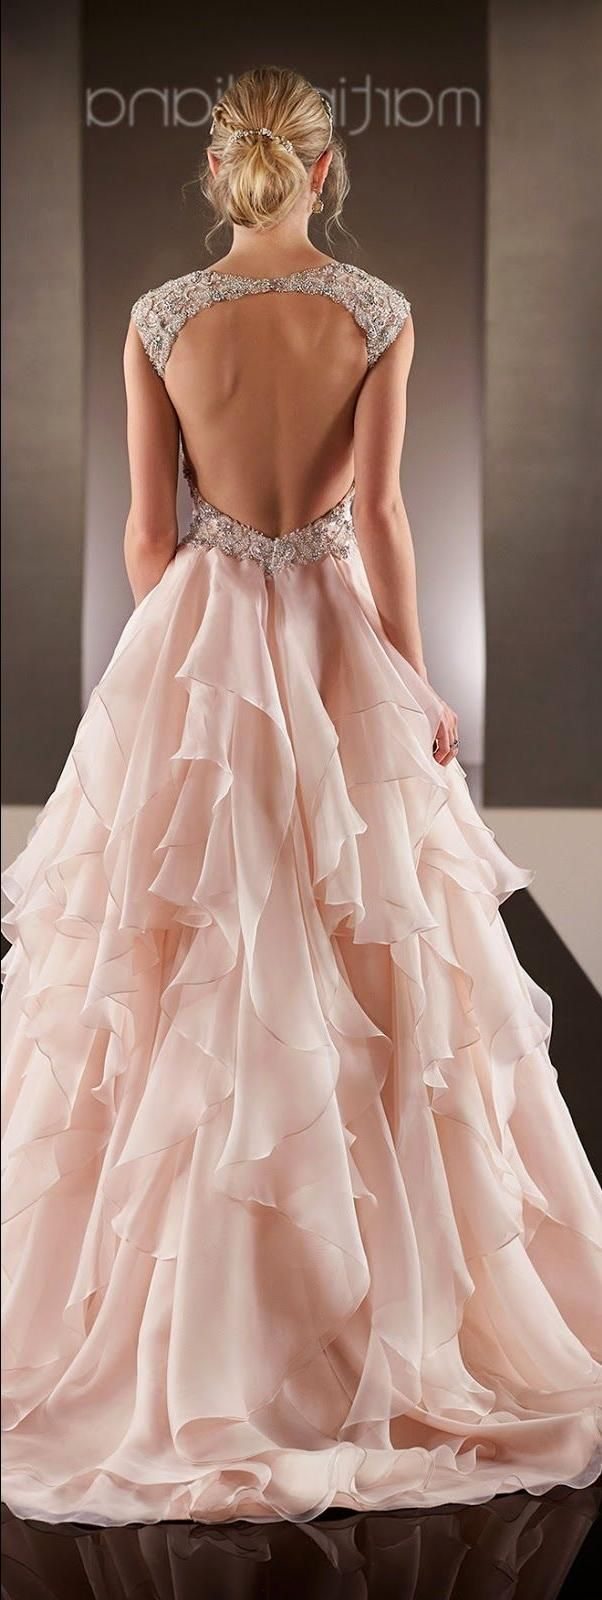 wedding dress | ❤❤❤ACCESSORY and FASHION Style ❤❤❤ | Pinterest ...